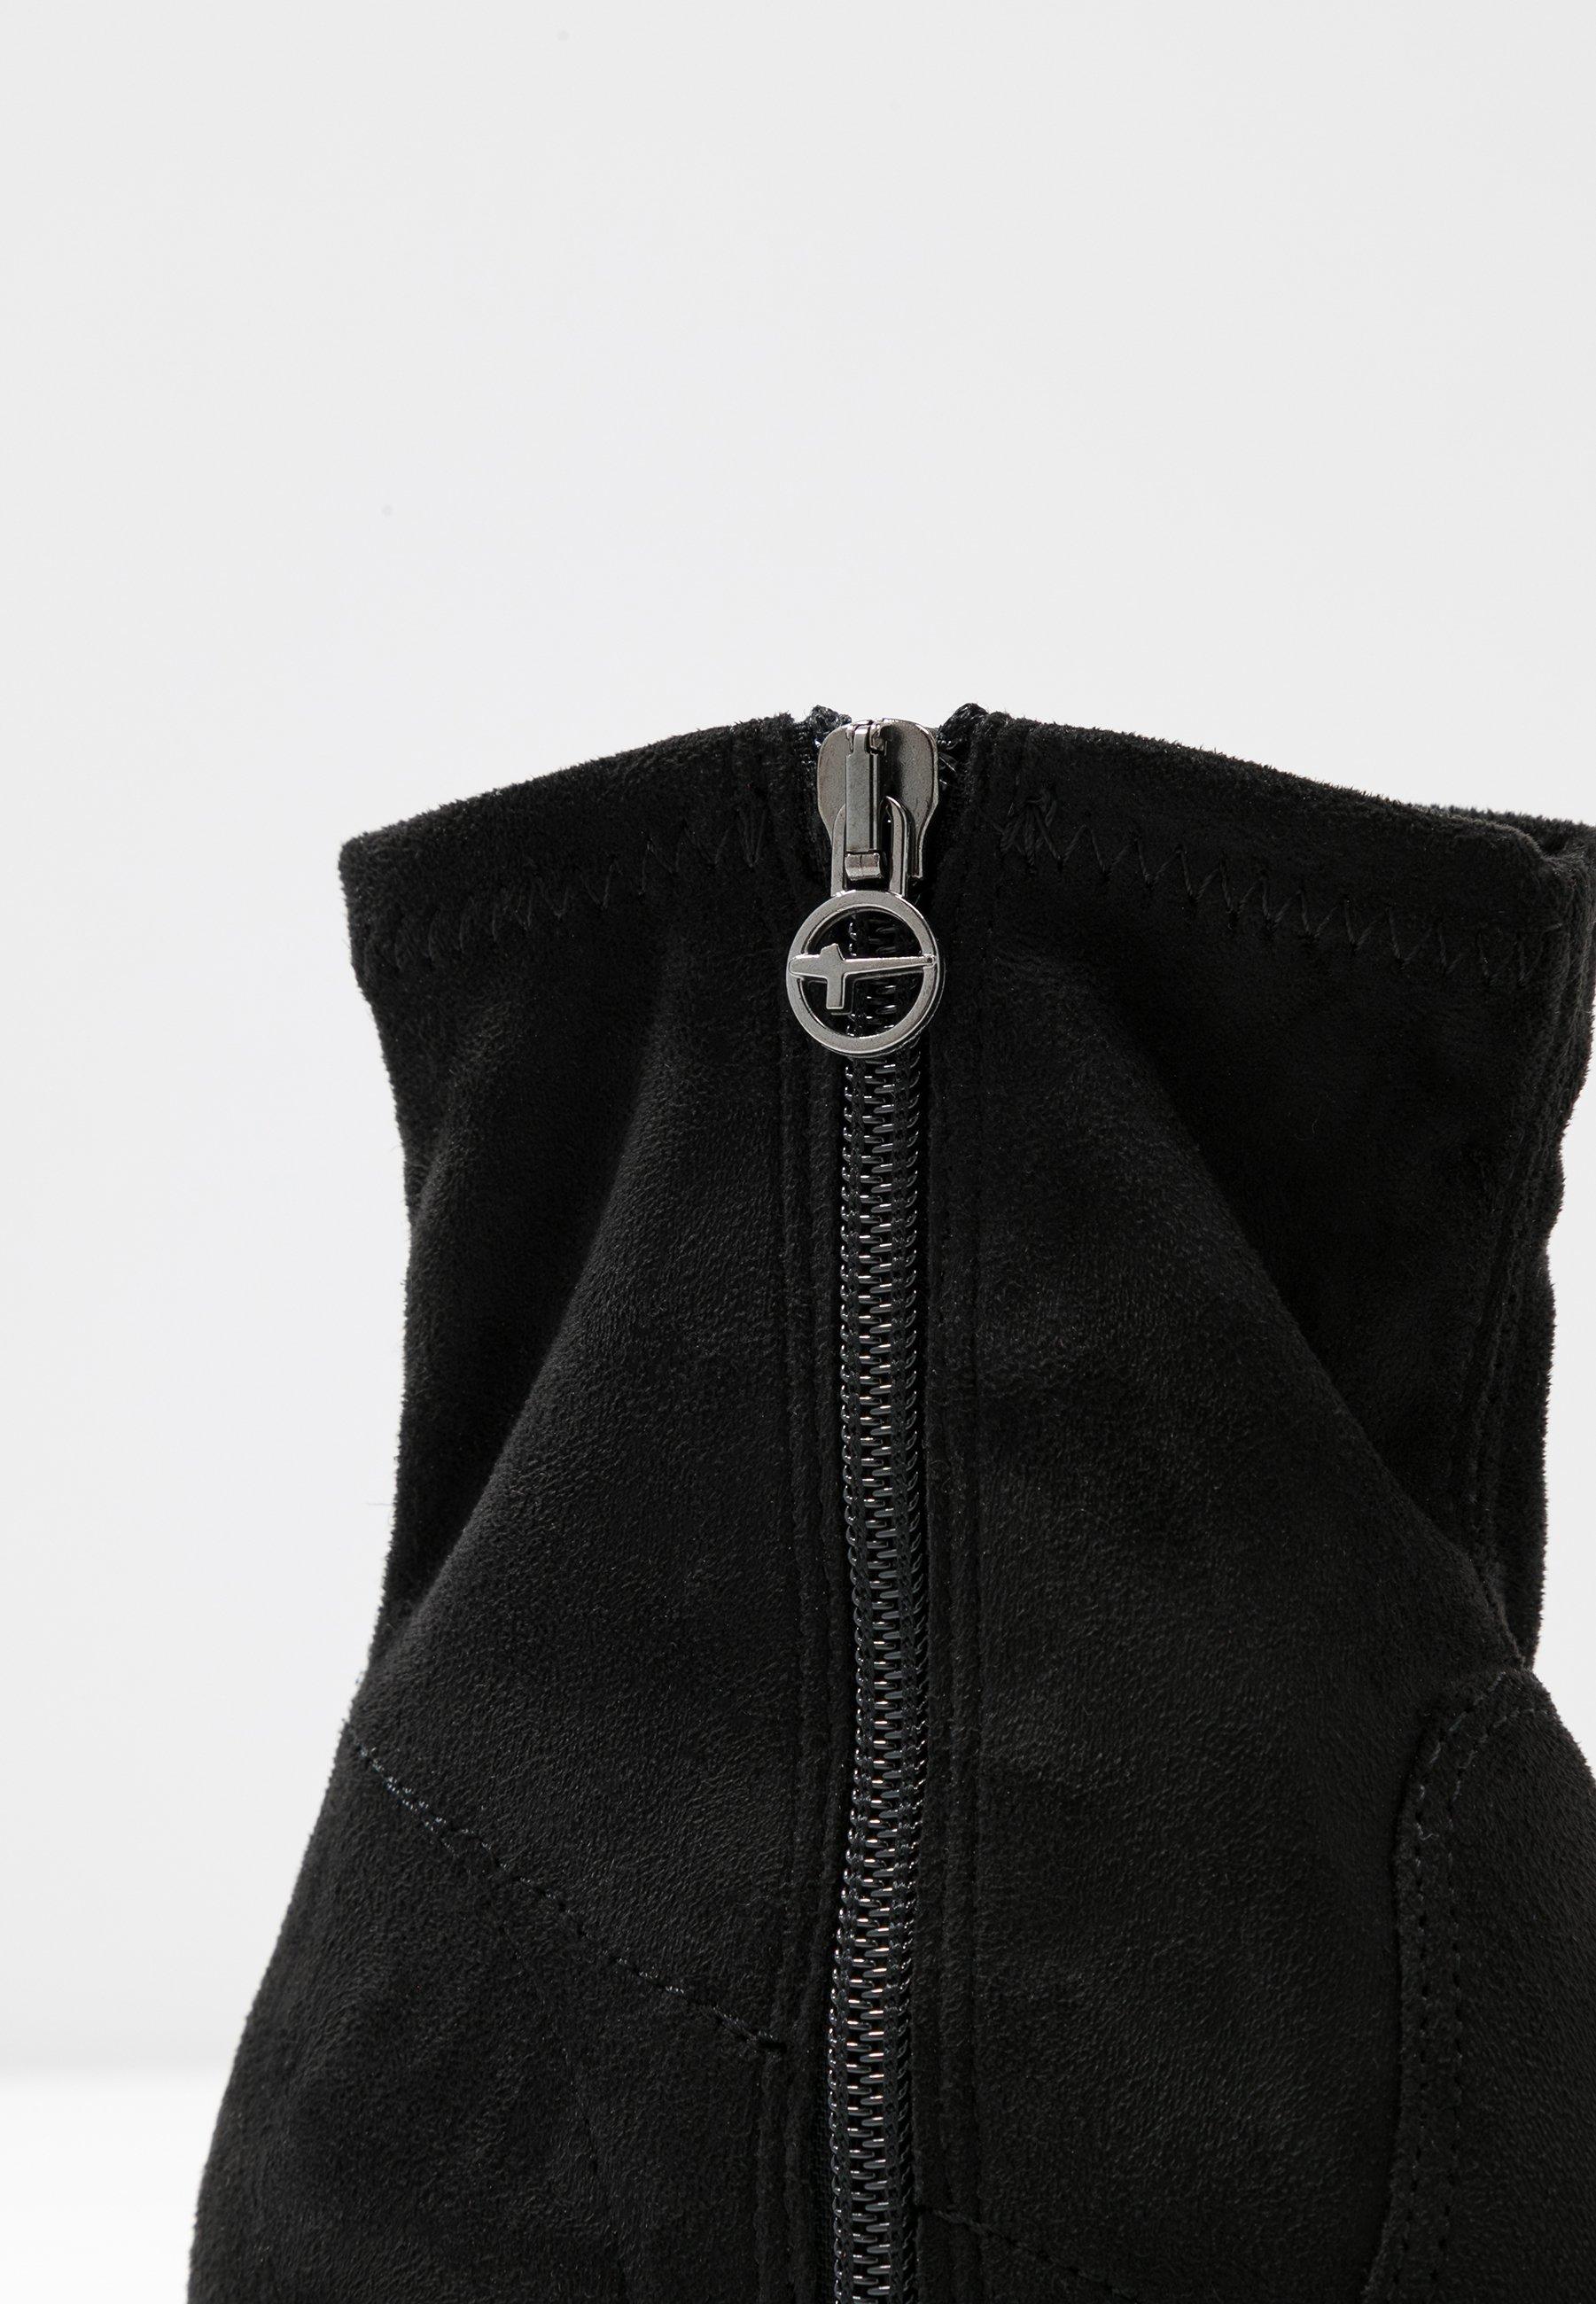 Tamaris Boots - Støvletter Black/svart